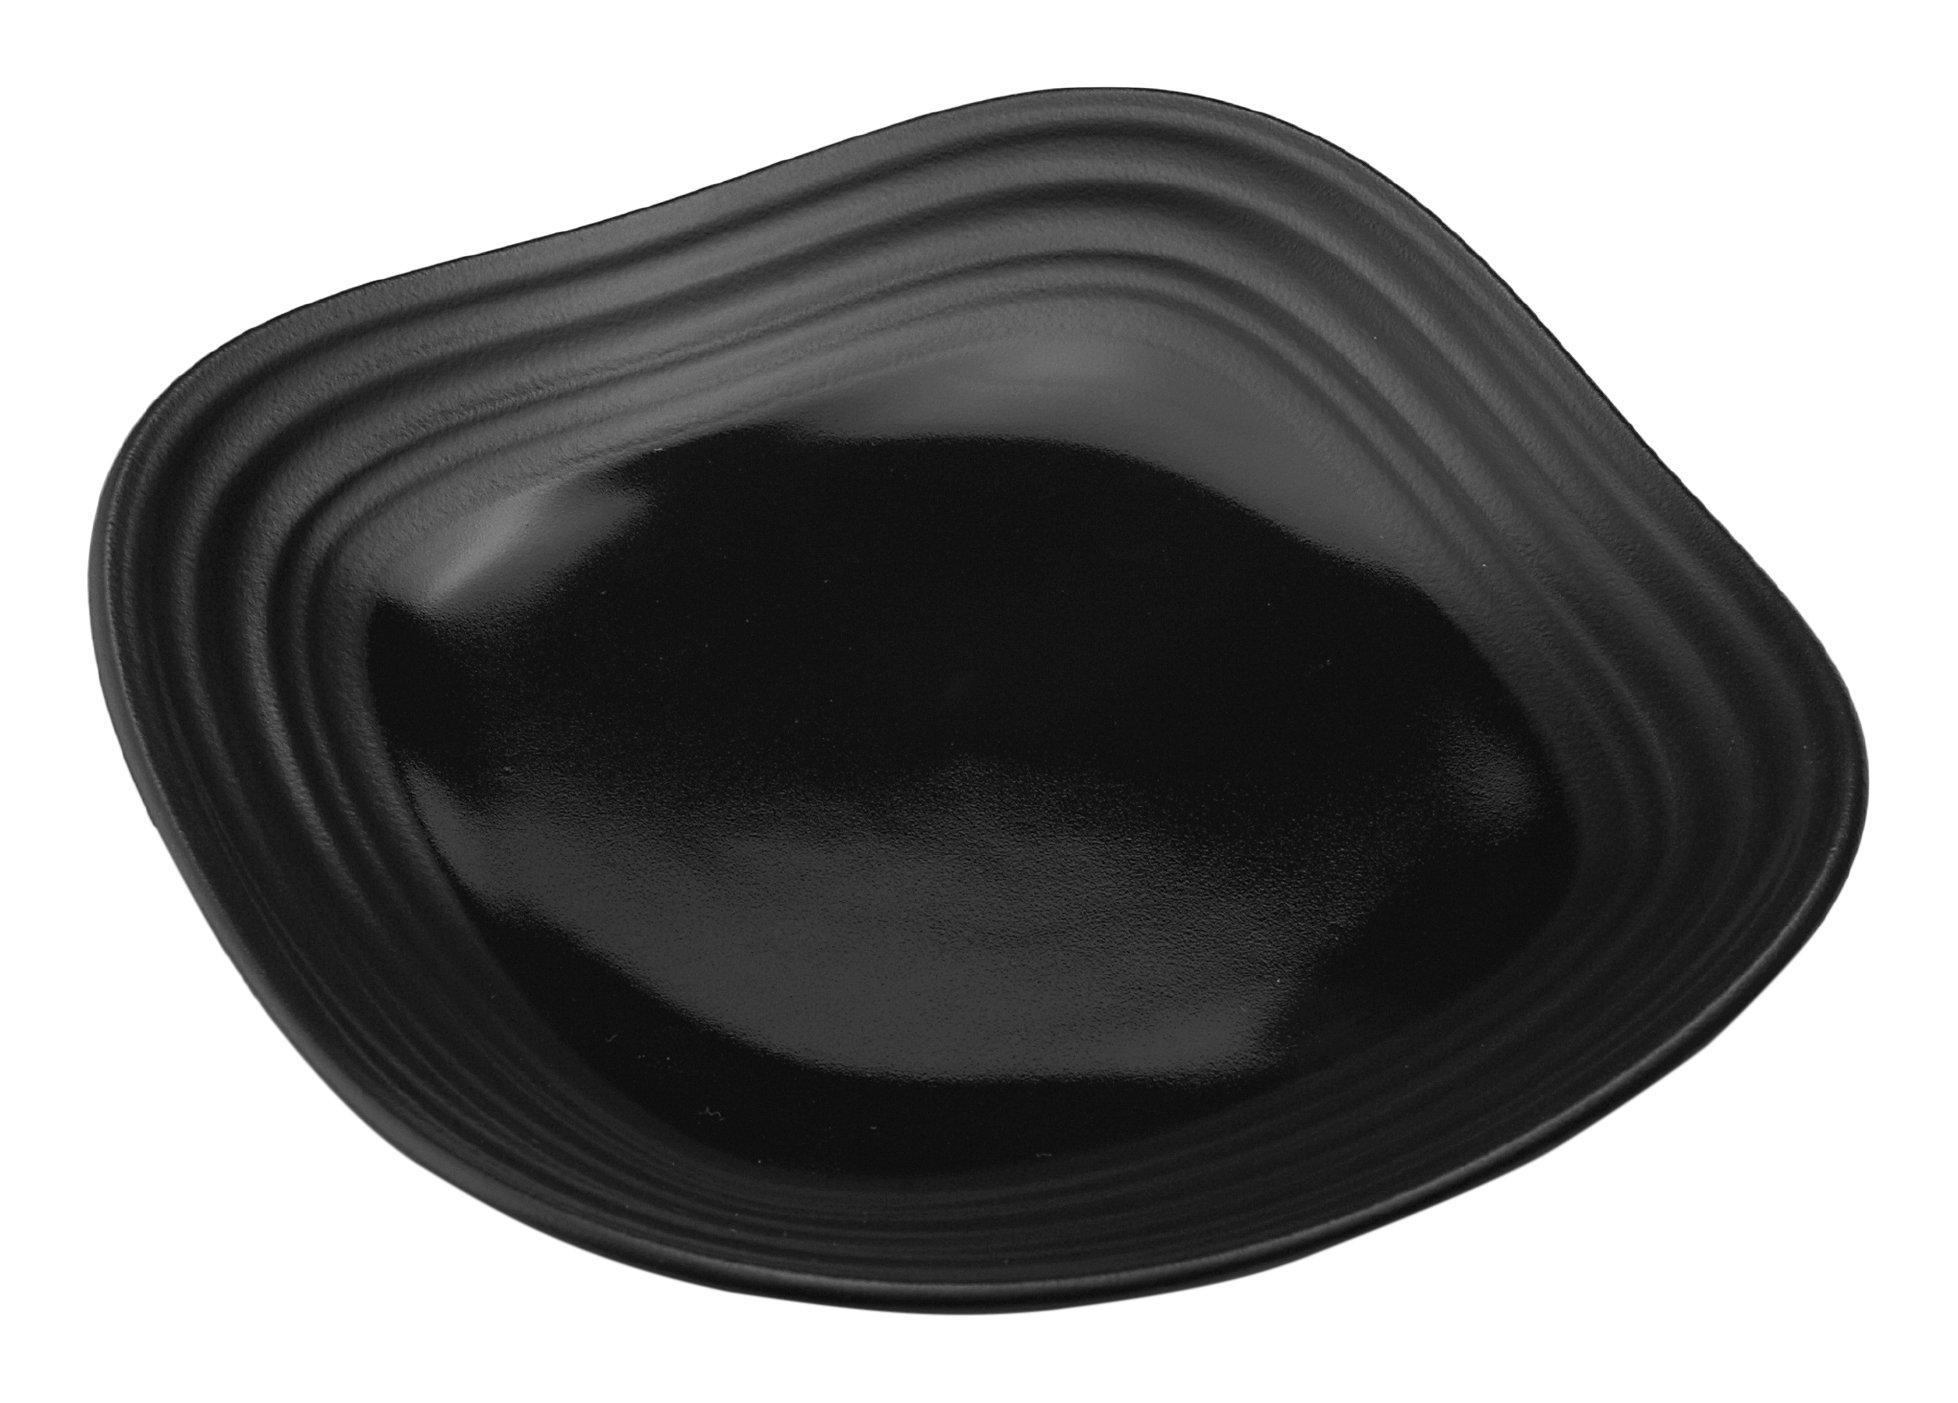 Mikasa Swirl Square Appetizer Plate, 6'', Black